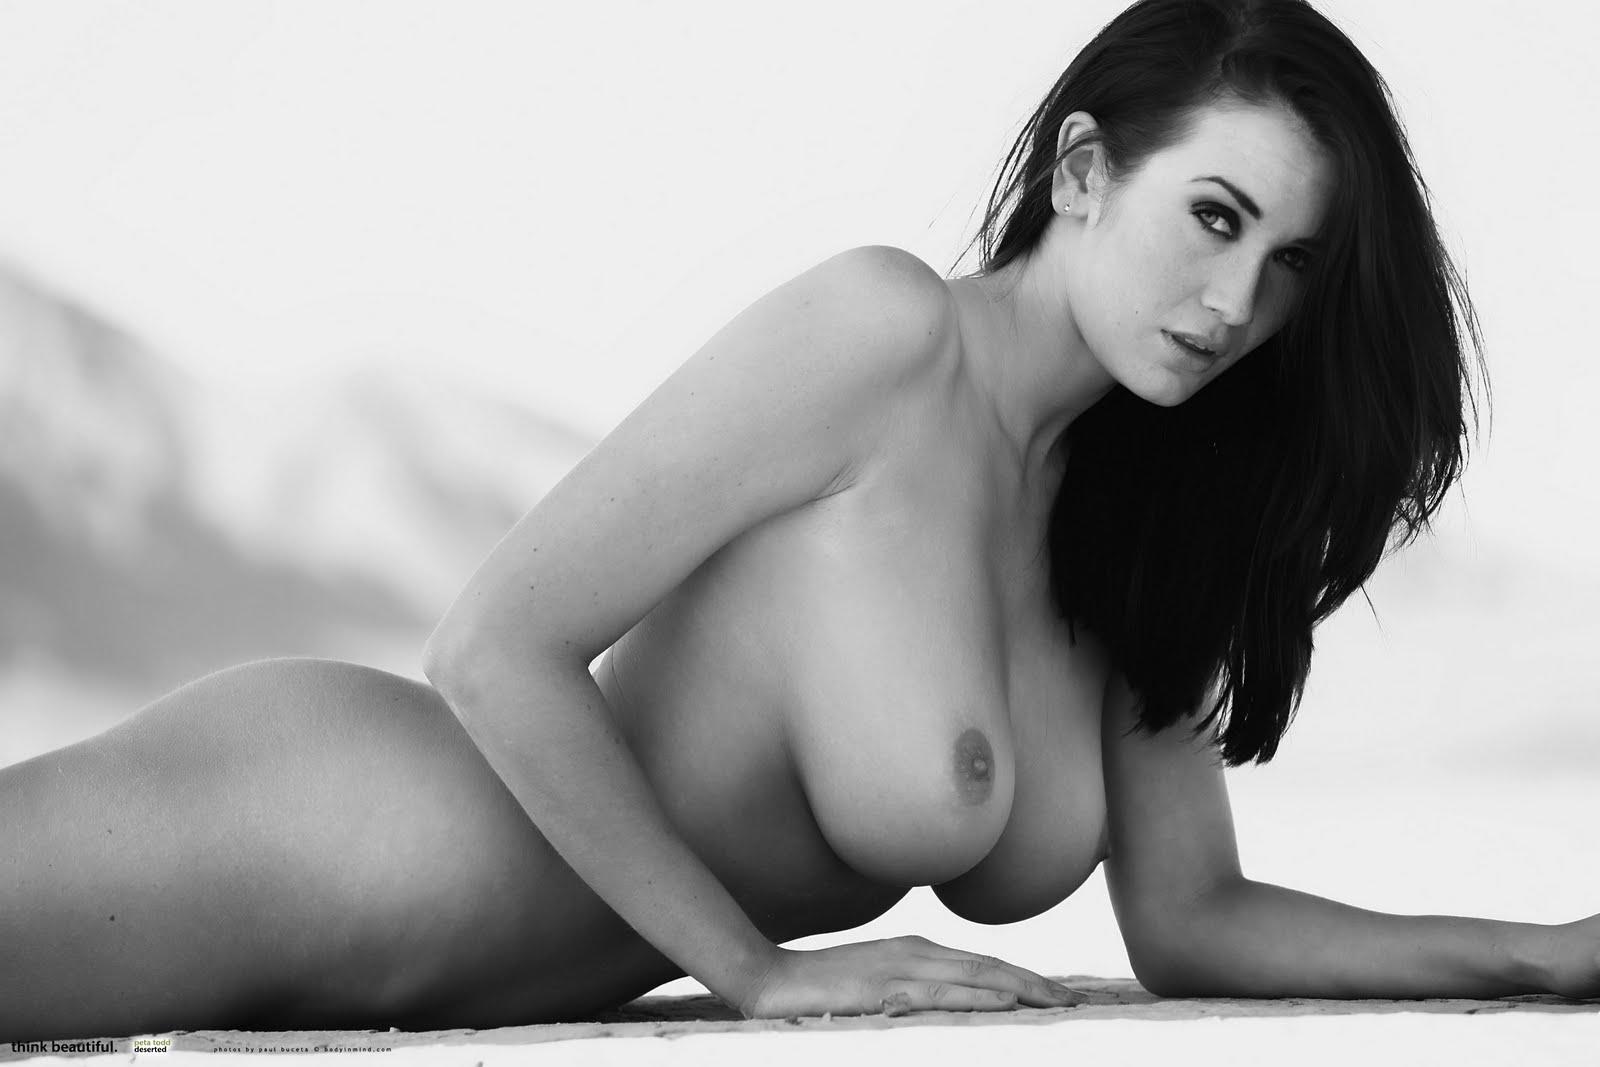 BestNudeCelebcom - Nude celebrity porn pictures and videos